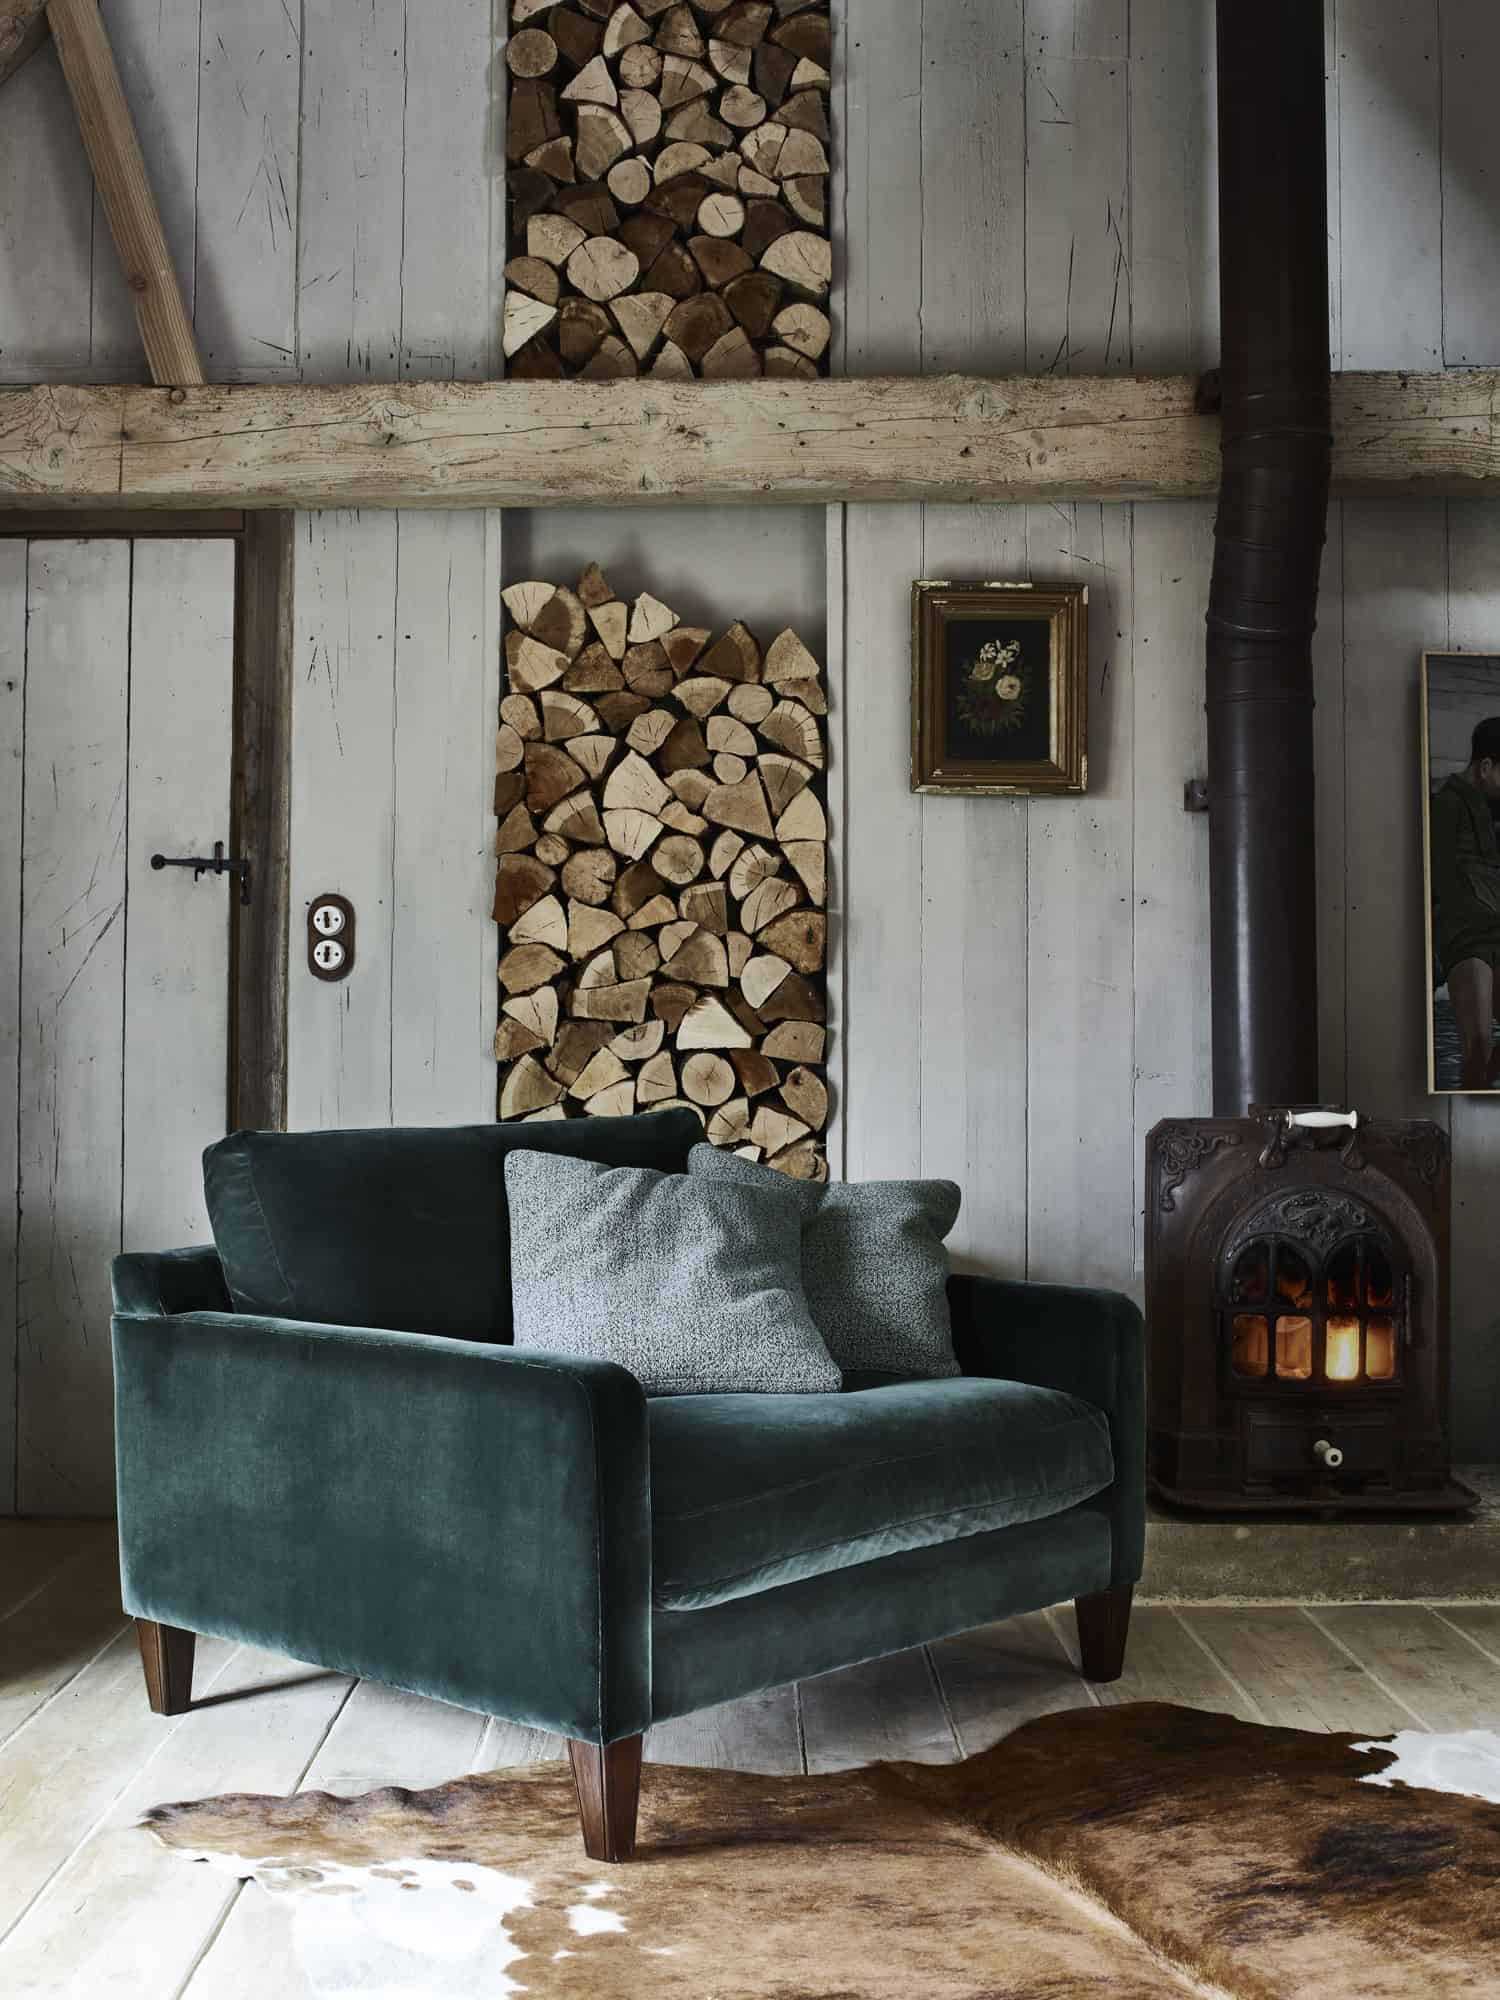 upholsterd chairs